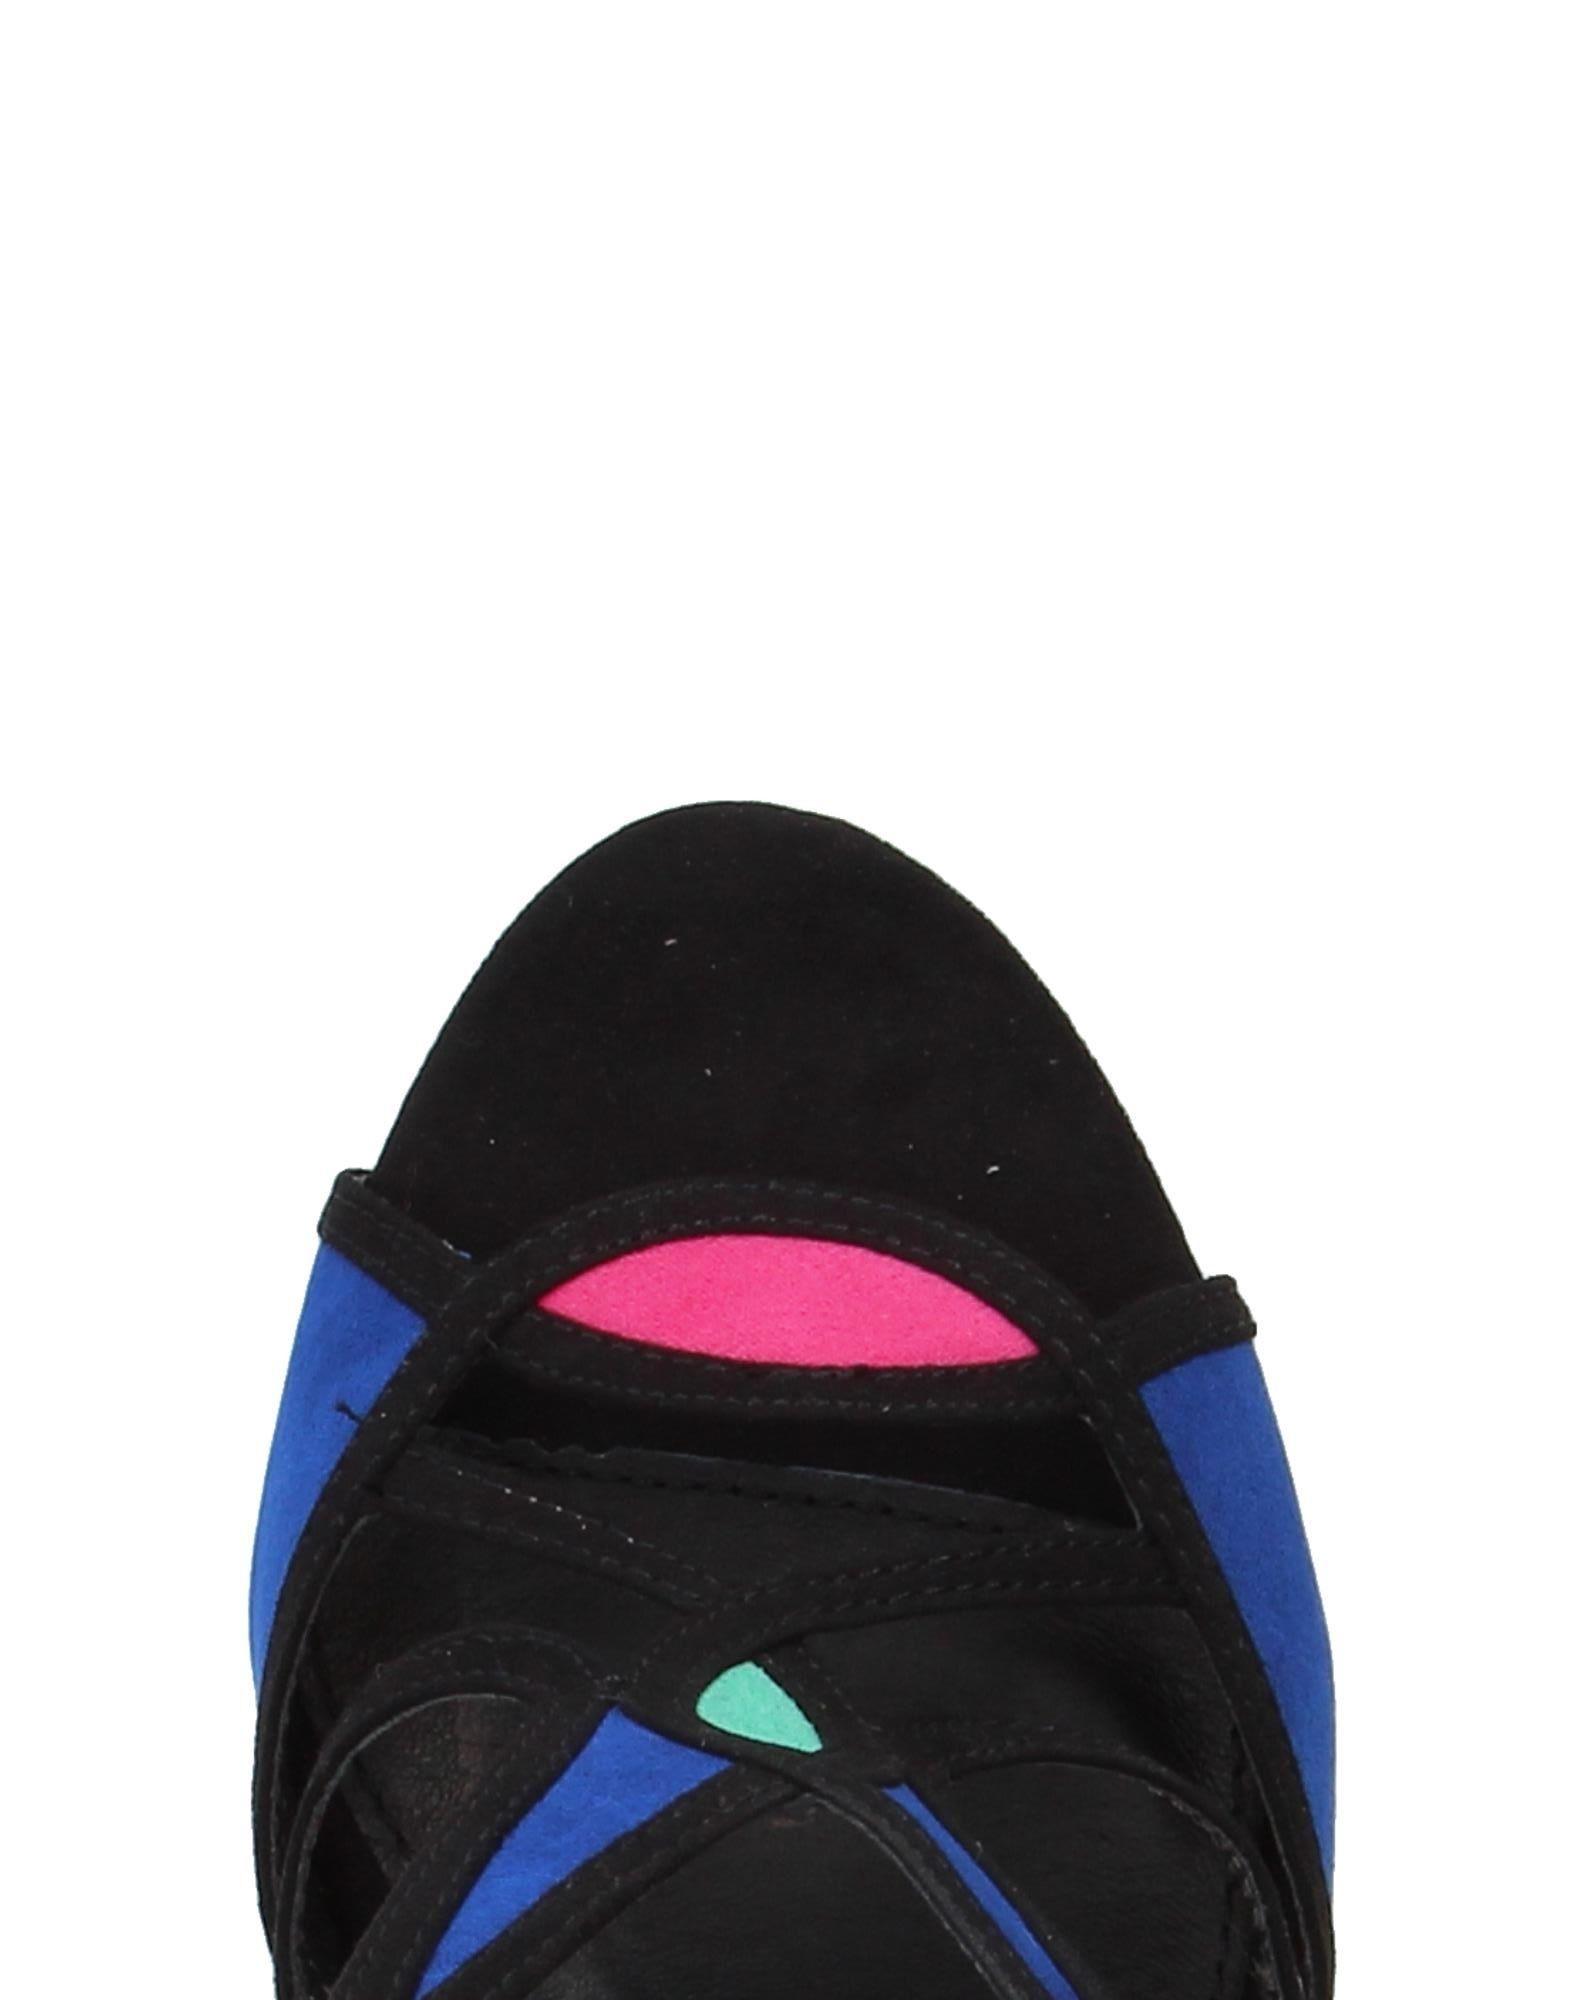 Le Chicche® Sandalen Damen  11343814ER Gute Qualität beliebte Schuhe